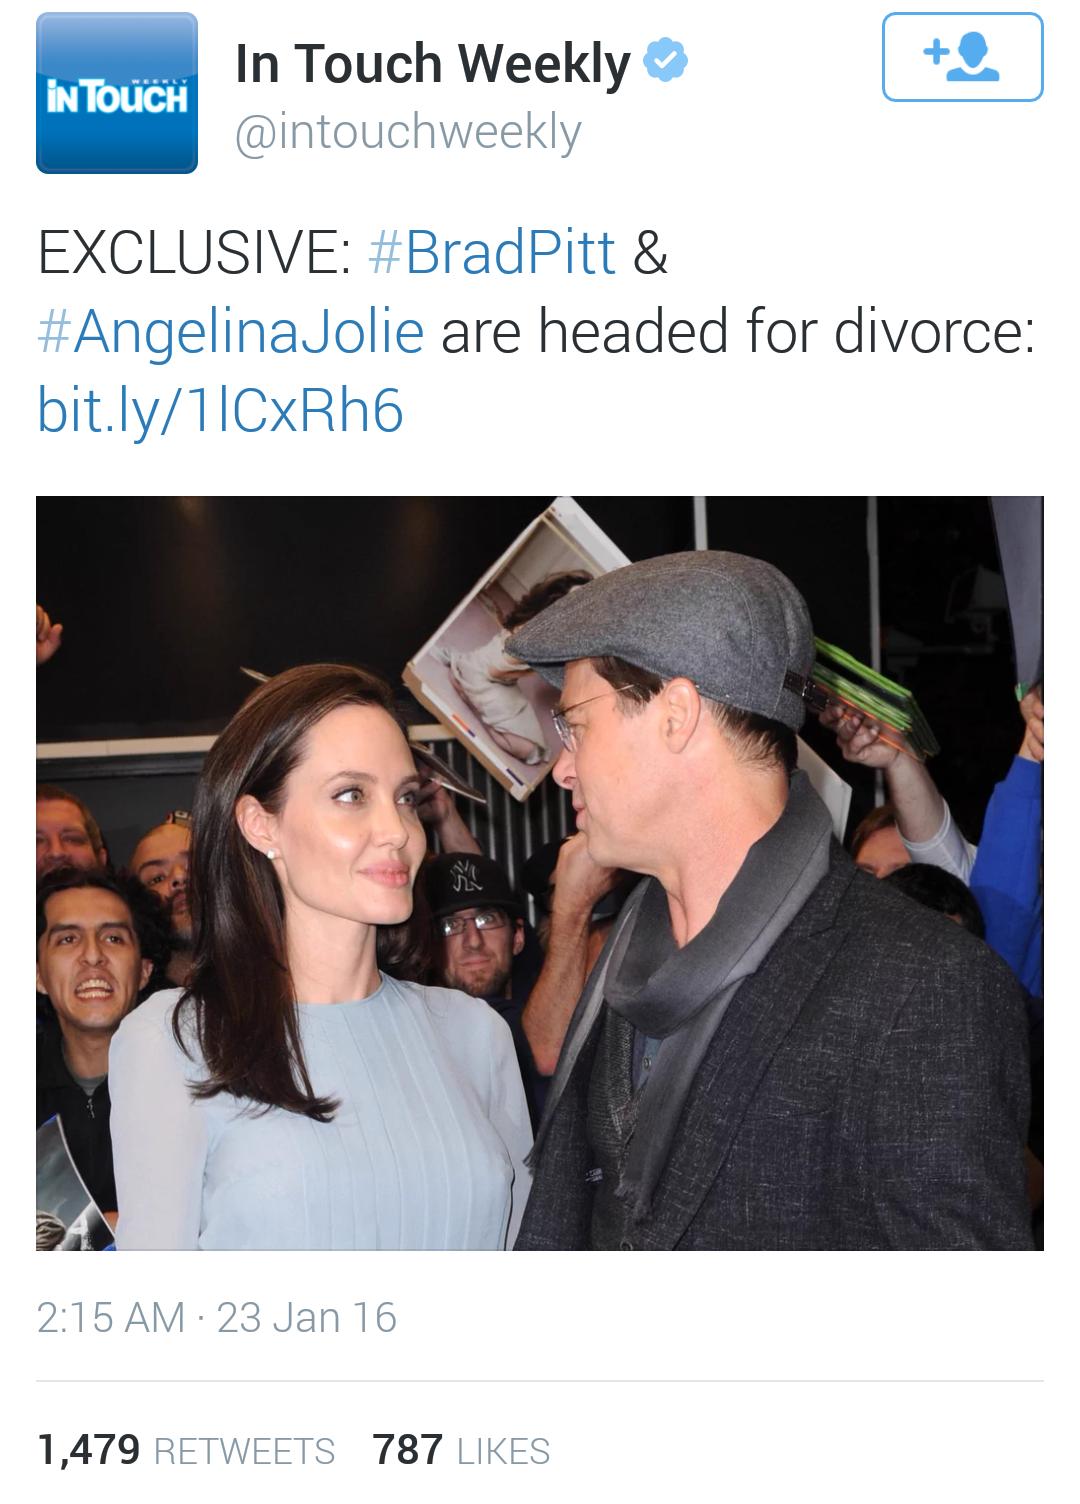 Brad Pitt and Angelina Jolie divorce